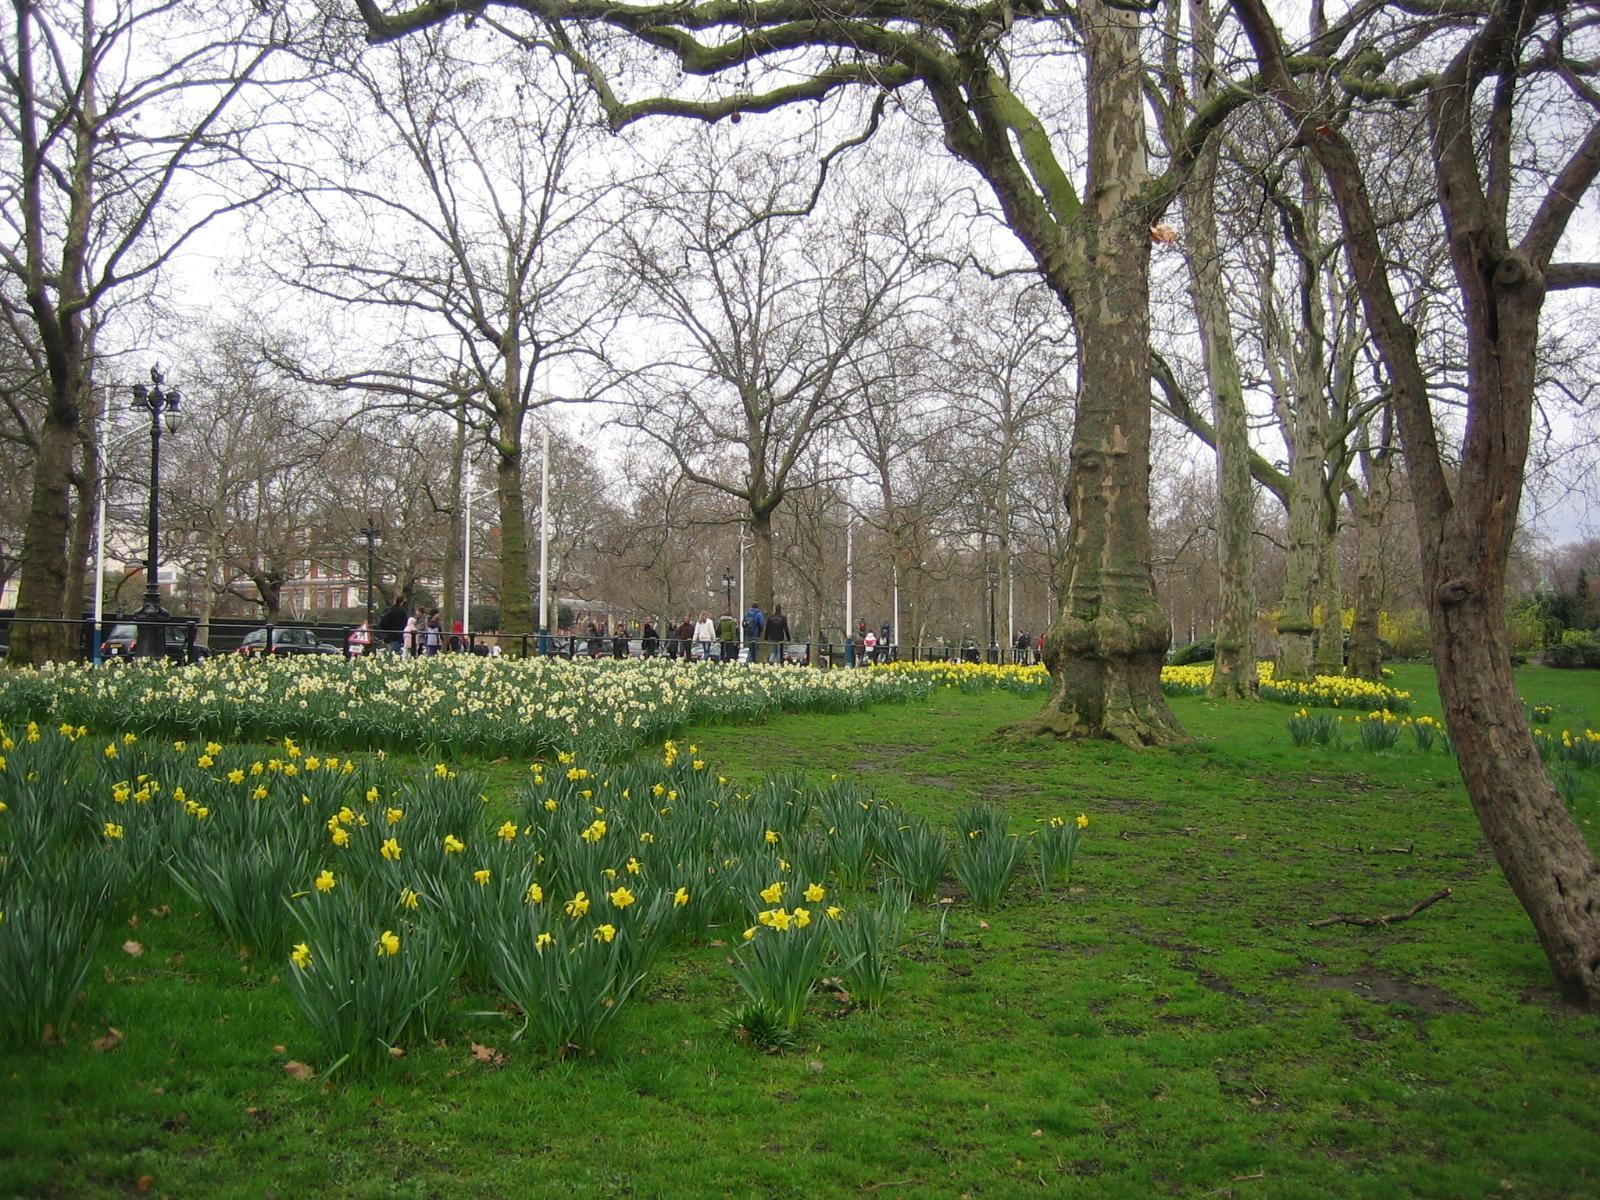 Alidei londres parques y jardines for Parques y jardines